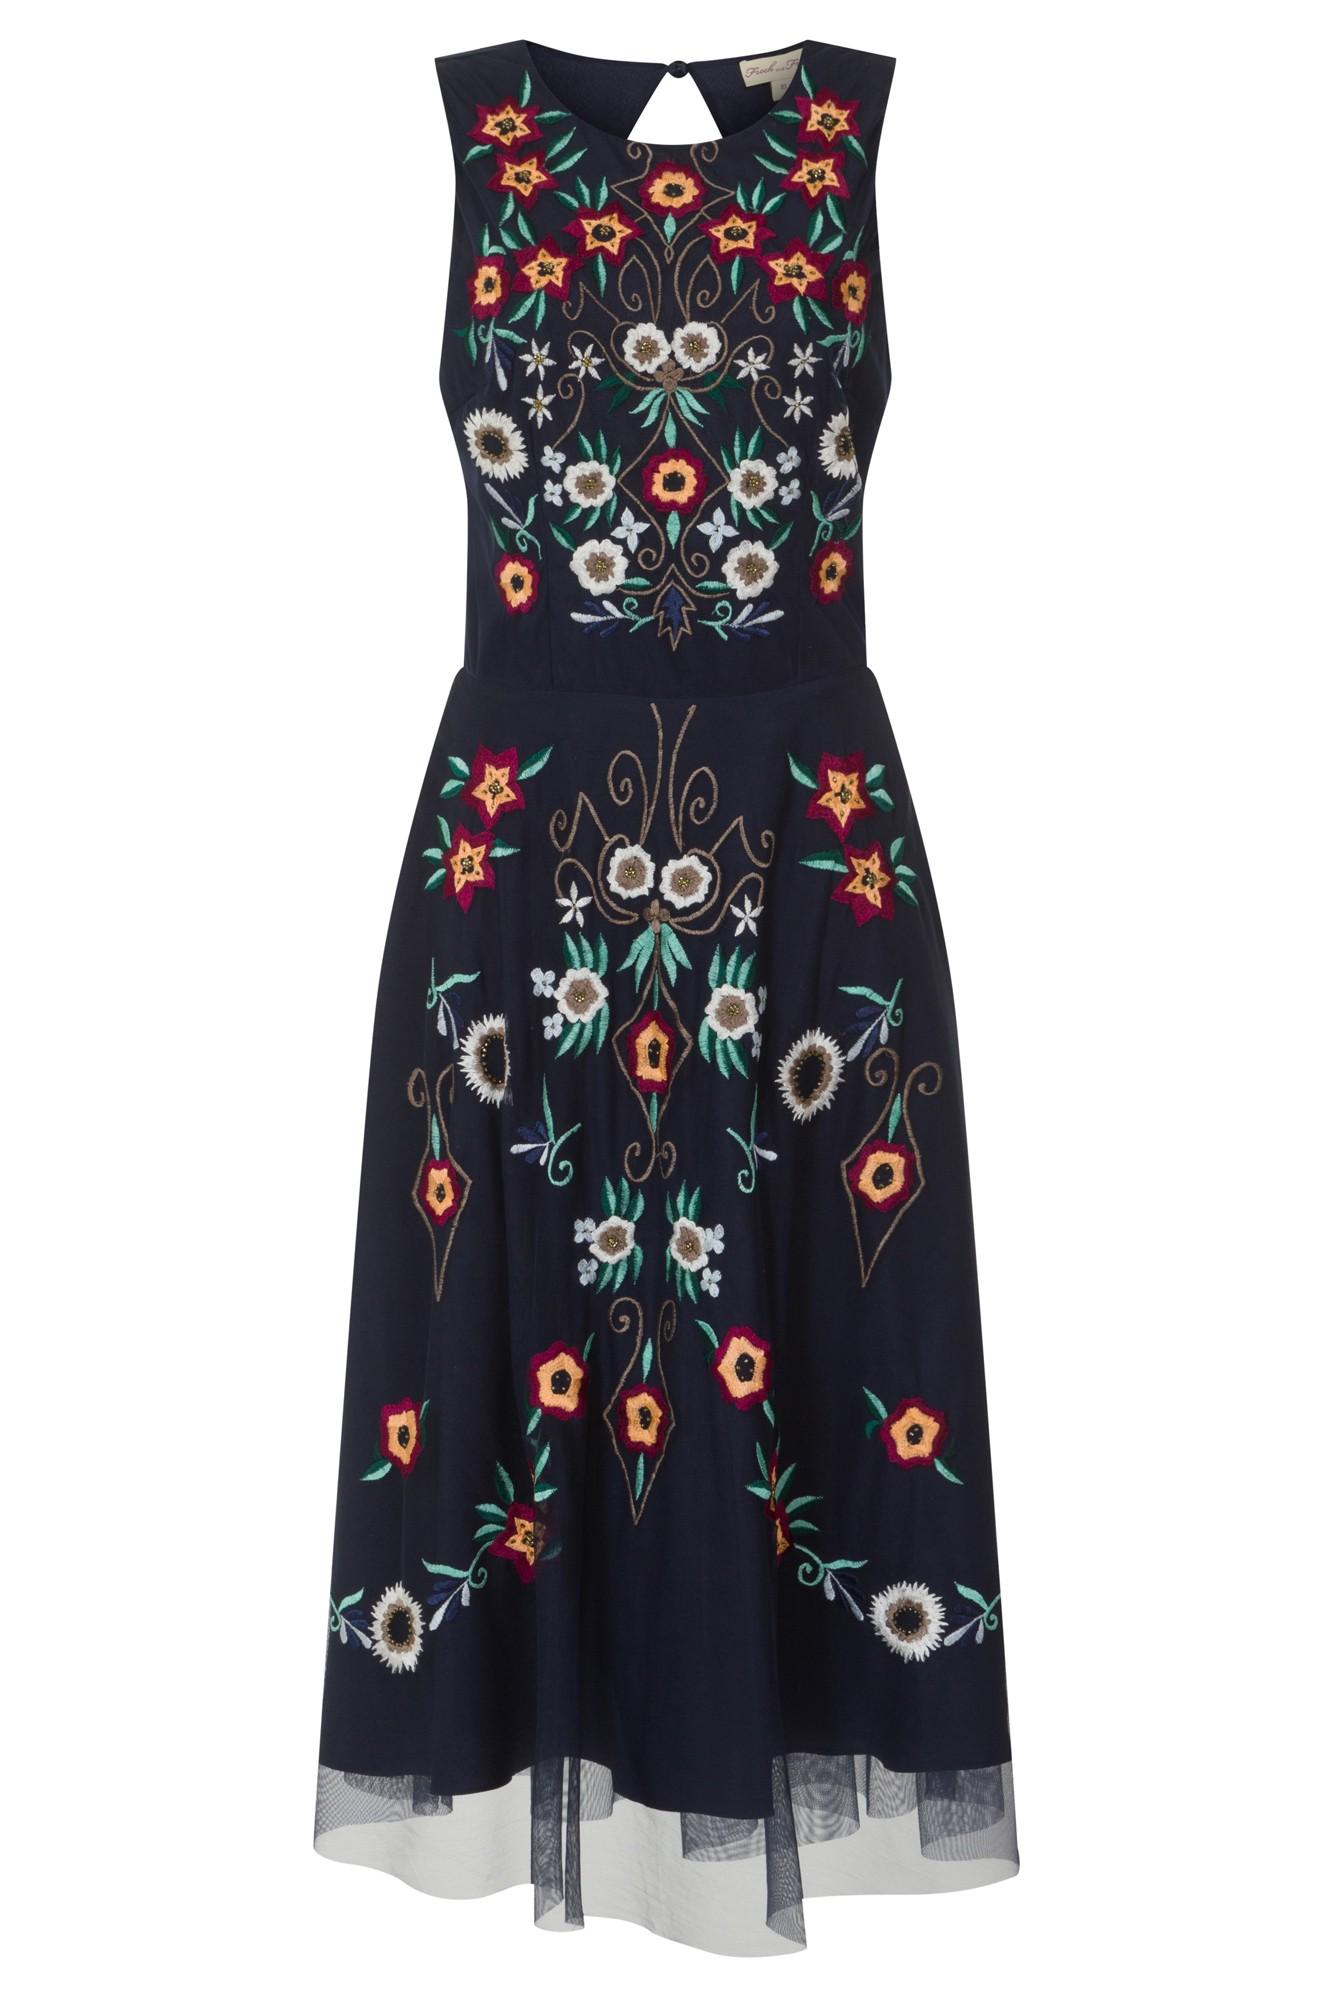 Aylen Embroidered Skater Dress (Frock & Frill)